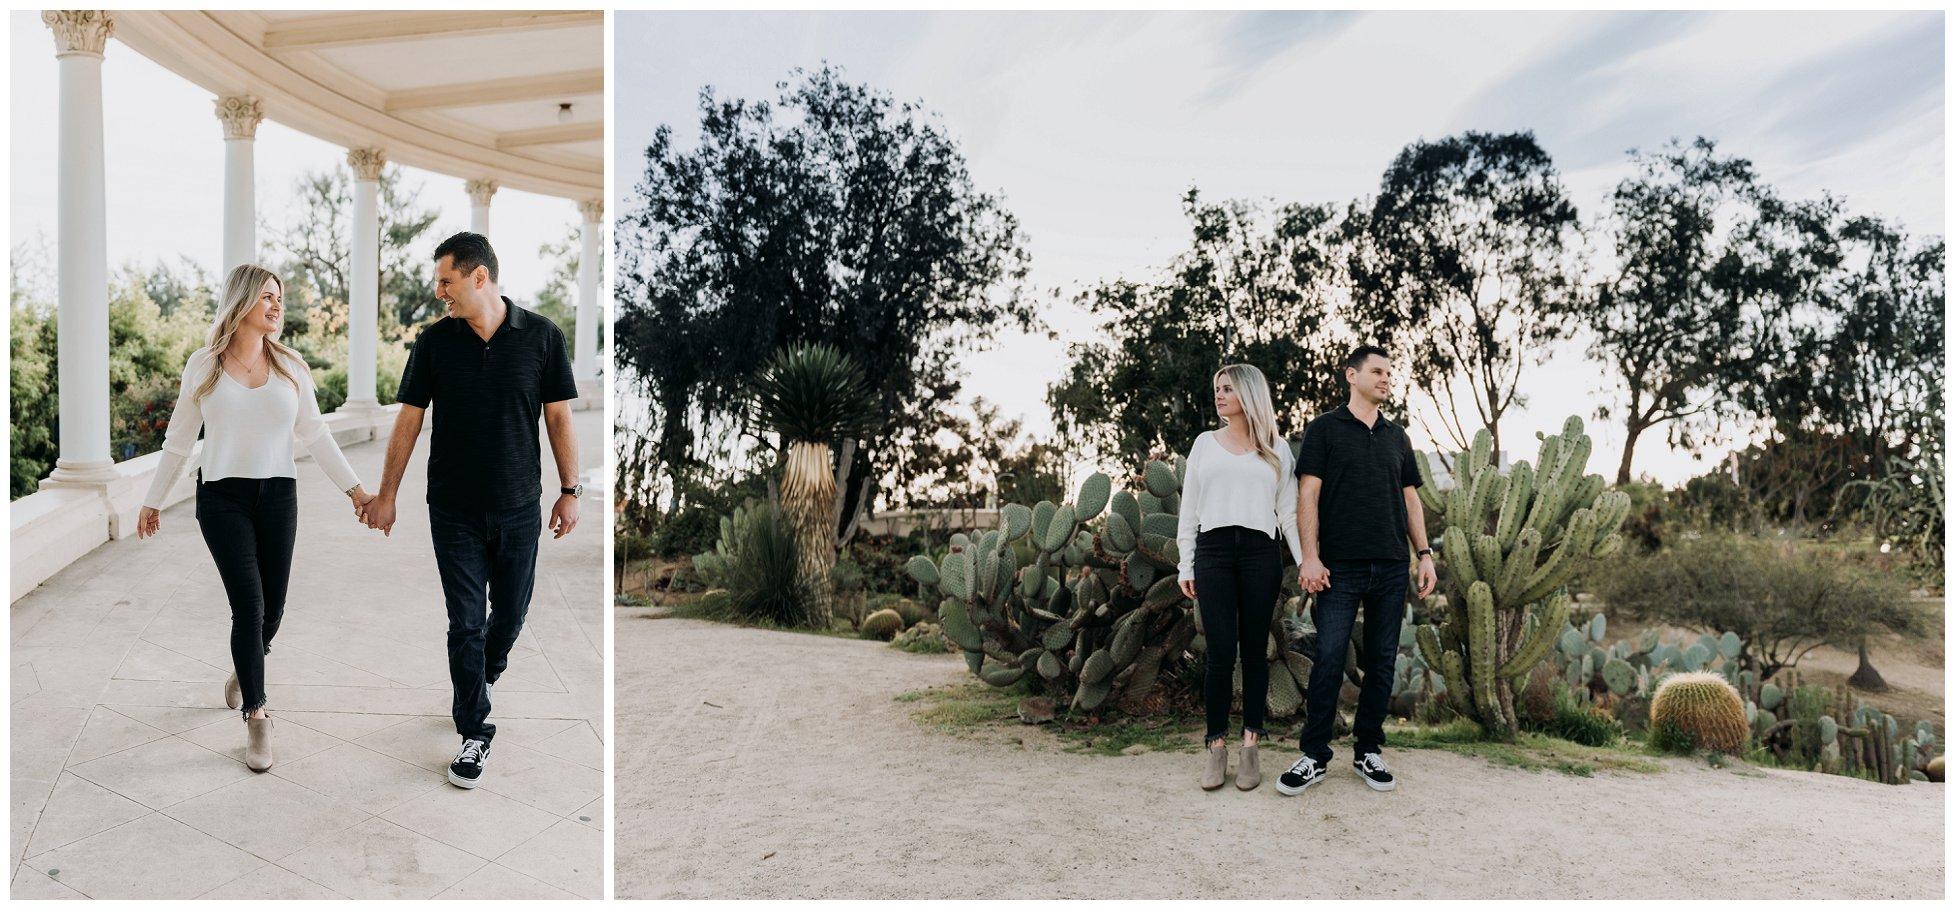 San Diego Engagement Photography | Balboa Park | Adrienne + Nik